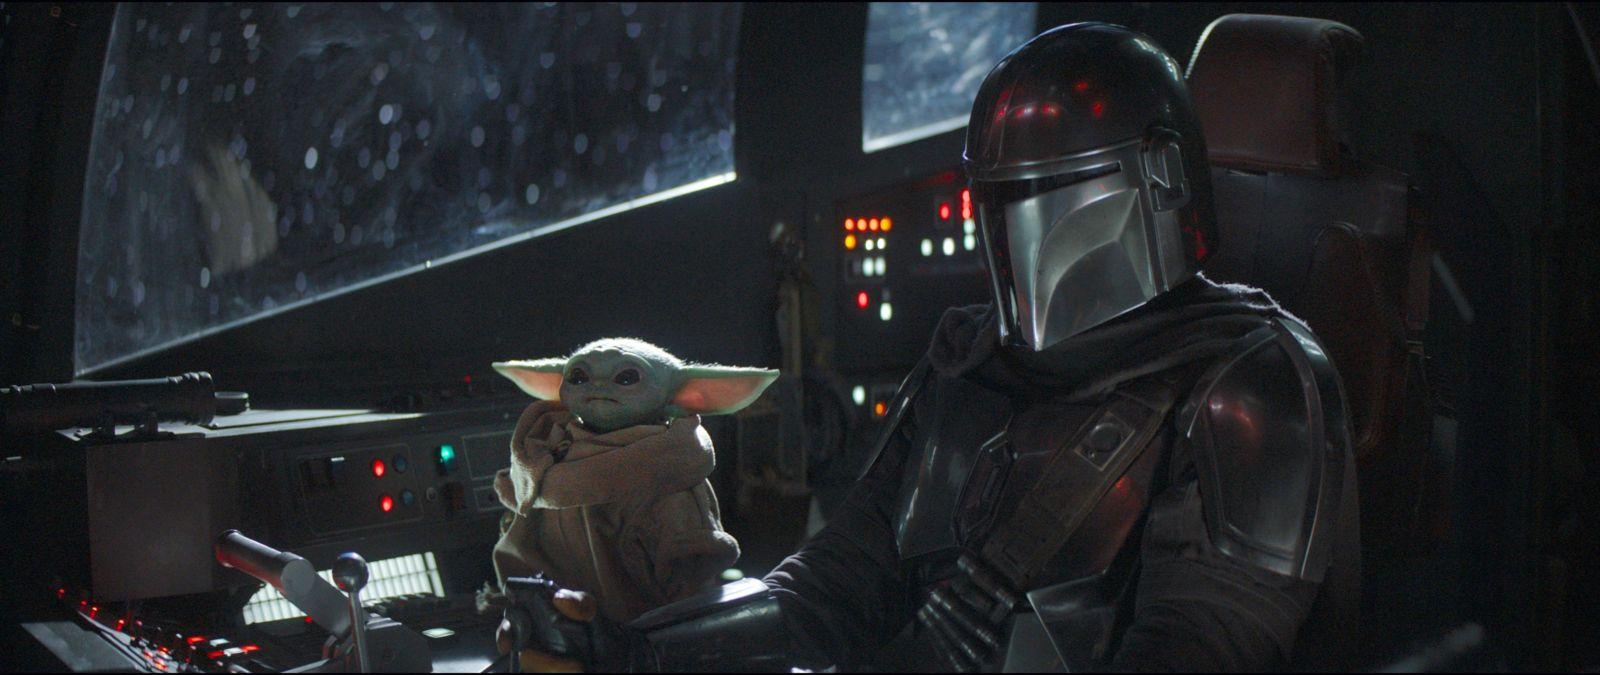 Baby Yoda on starship